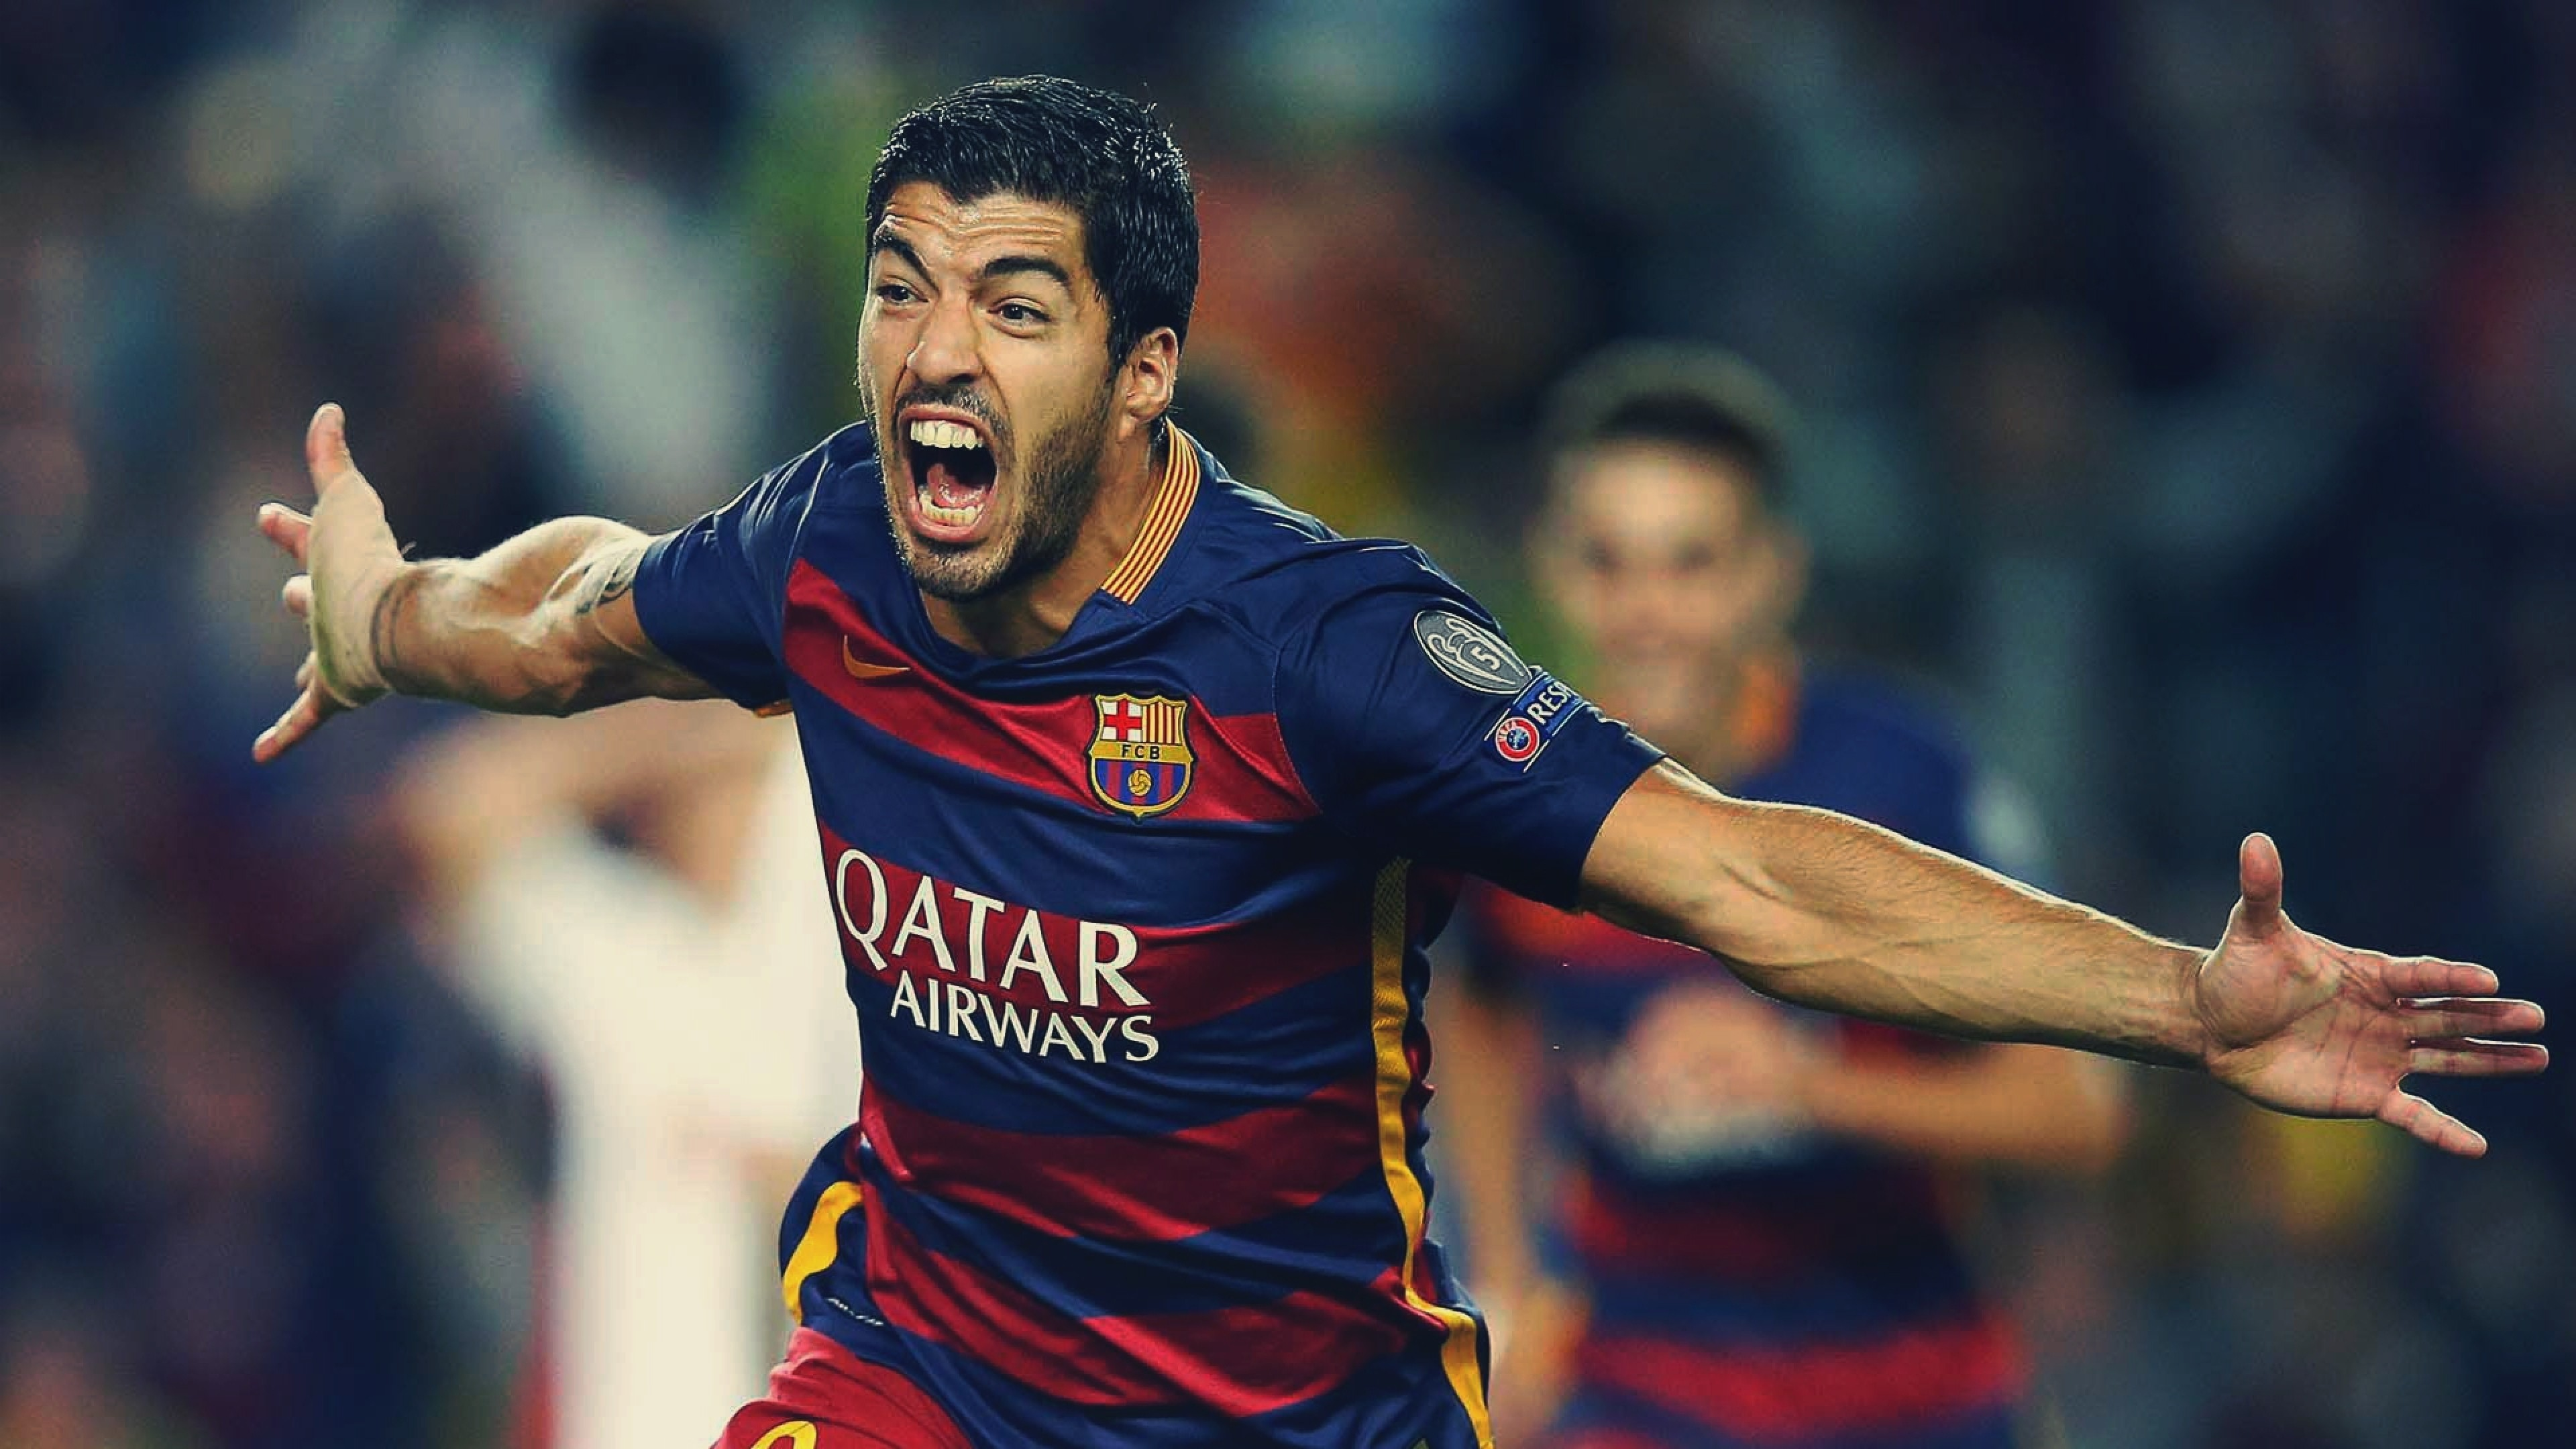 Wallpaper Luis Su 225 Rez Barcelona Fcb Soccer 4k Sport